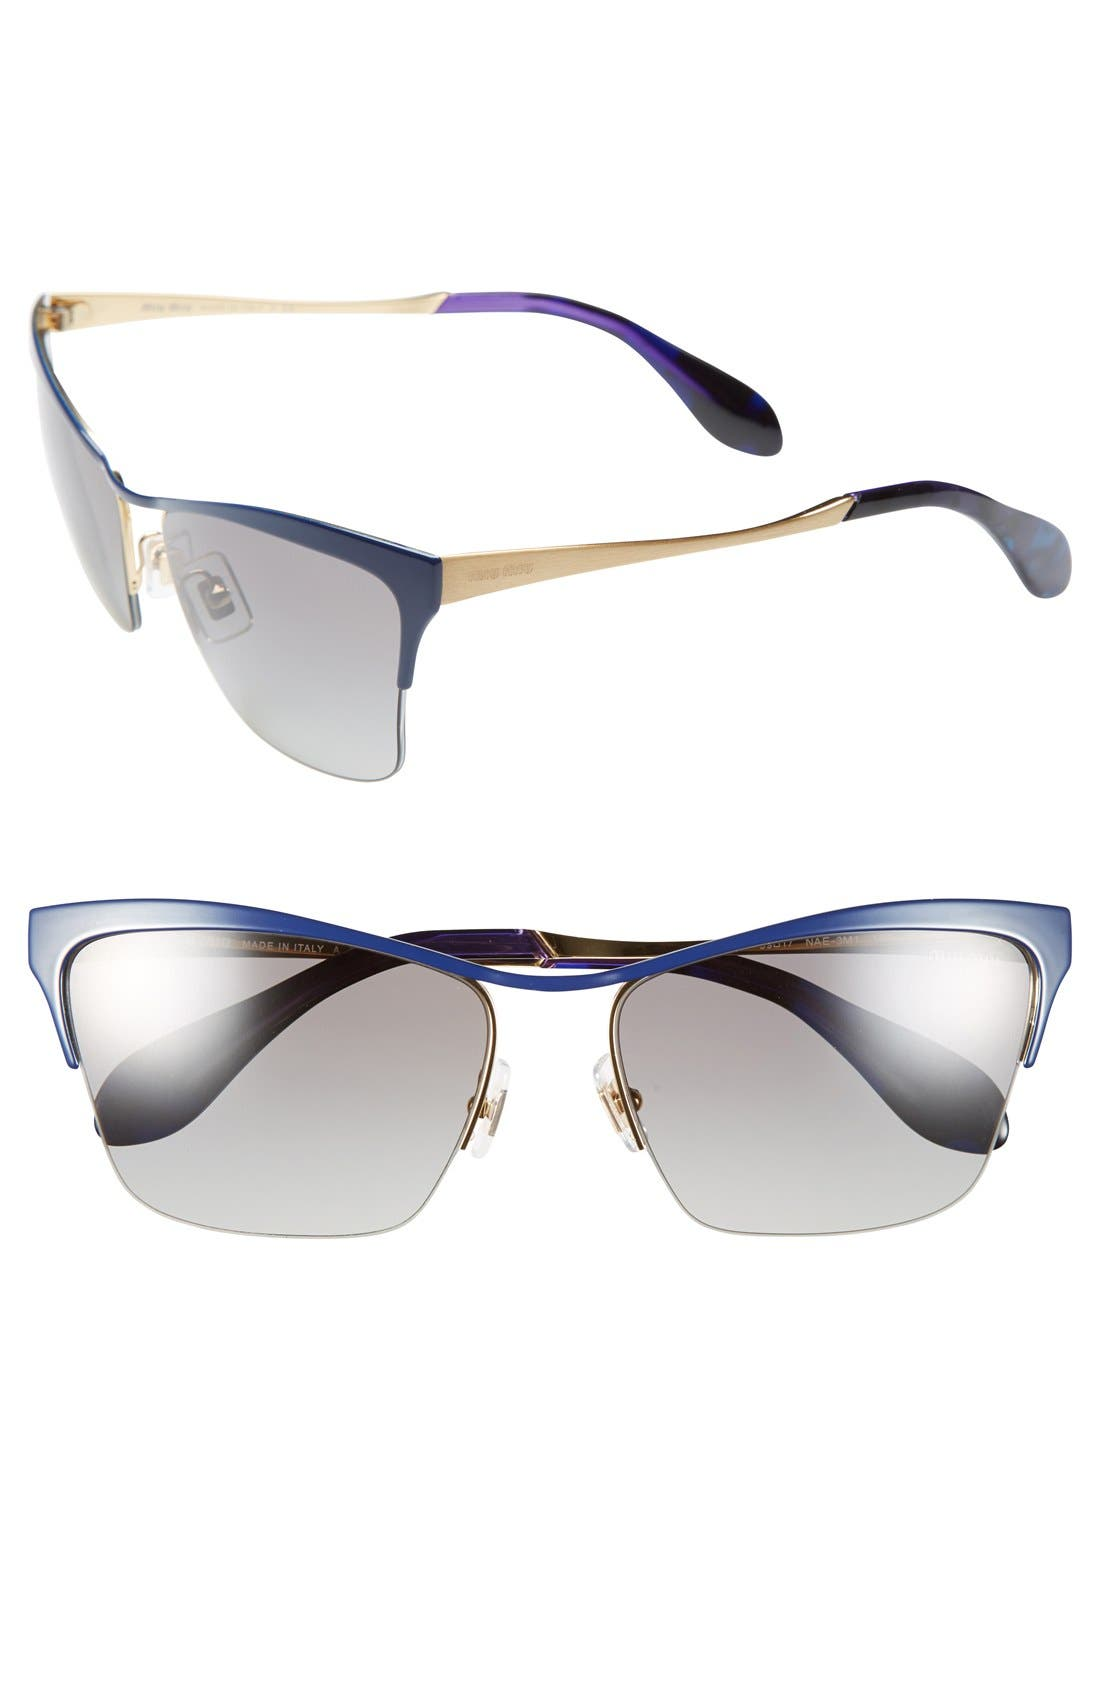 Alternate Image 1 Selected - Miu Miu 59mm Semi Rimless Sunglasses